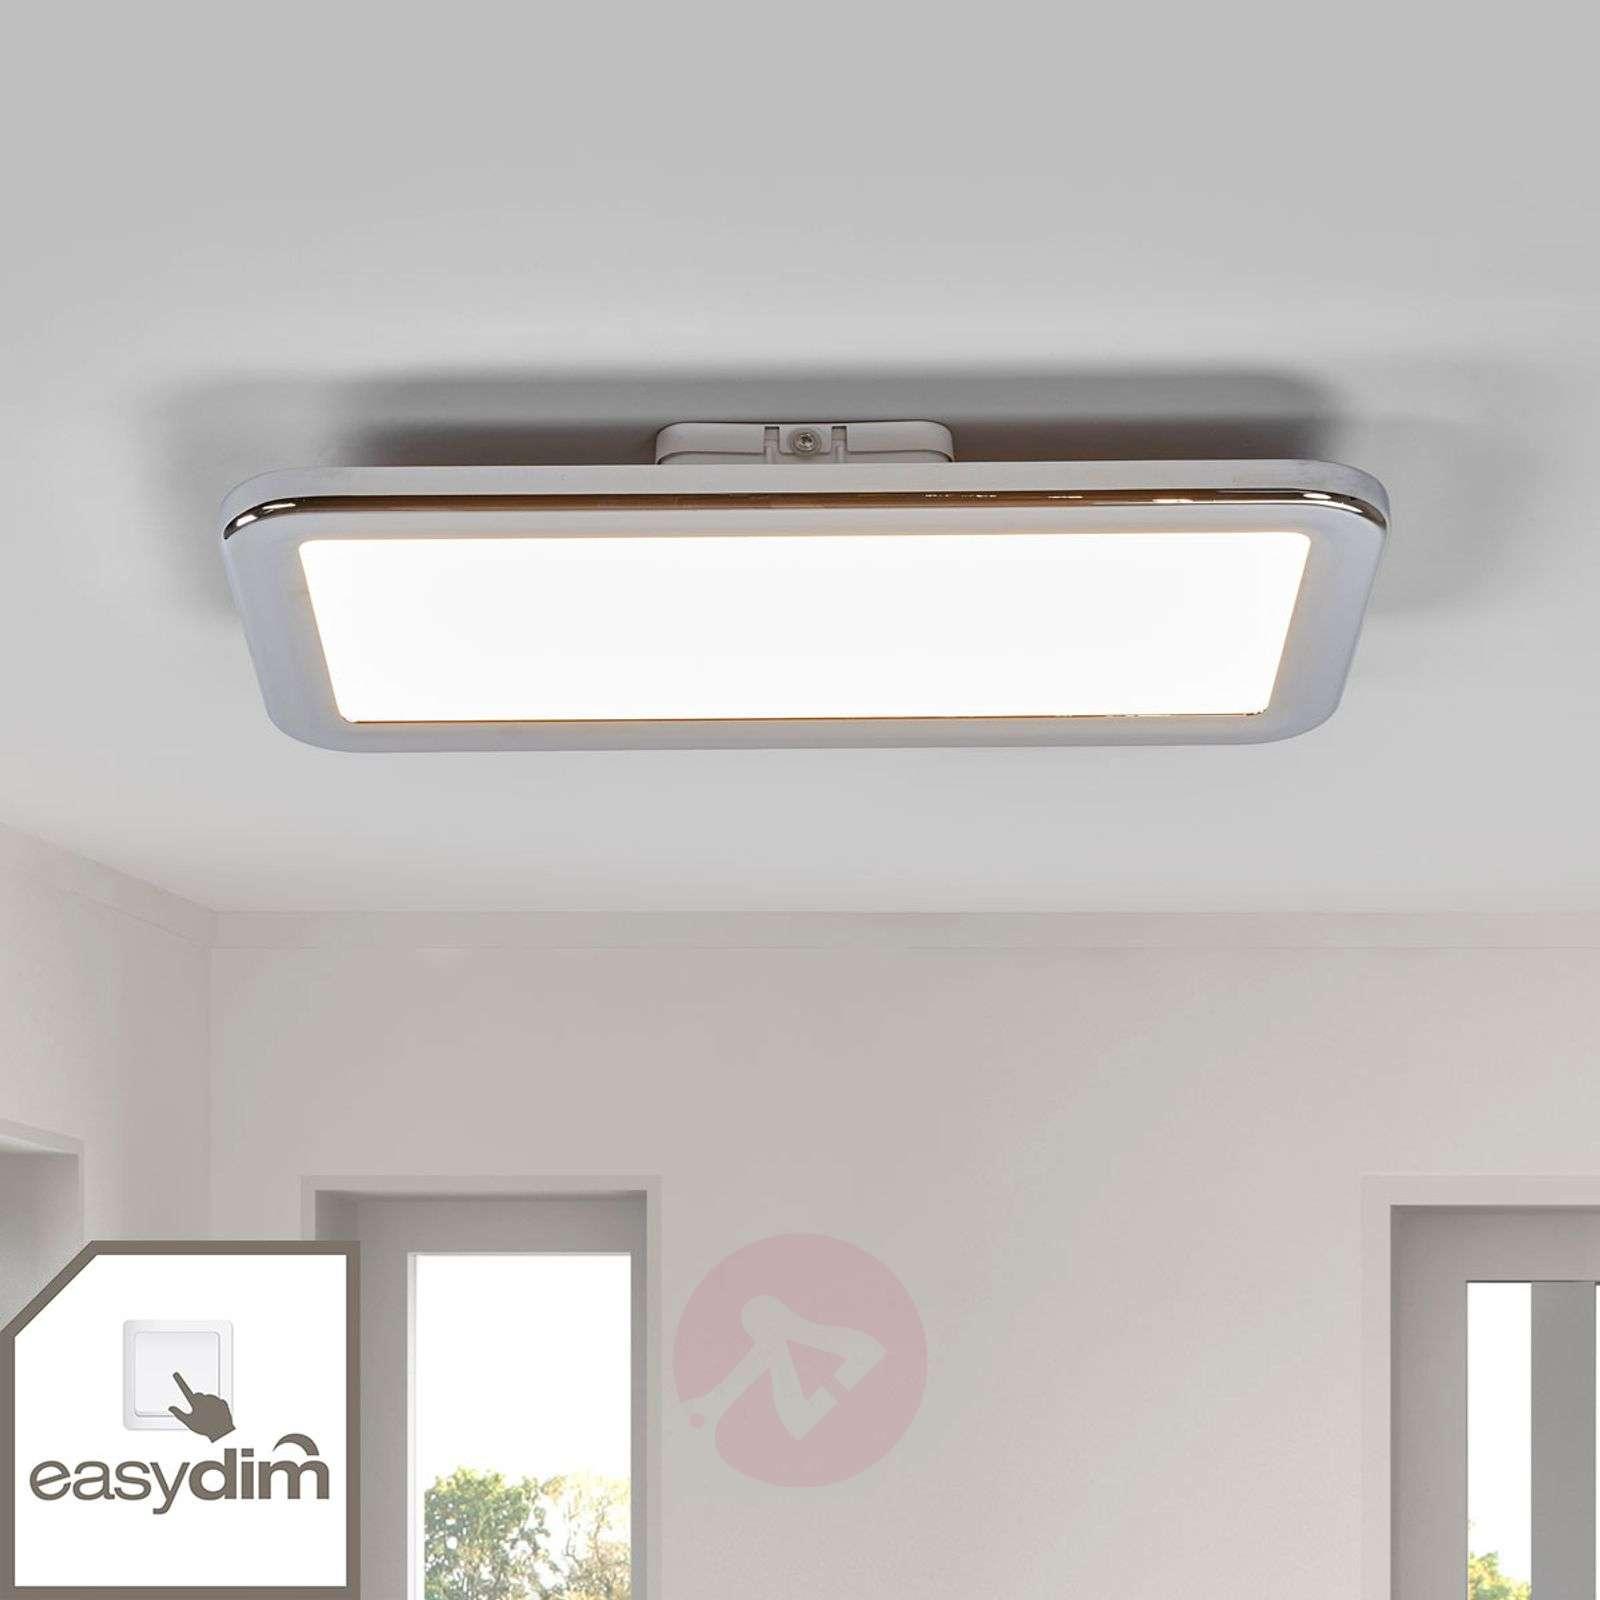 Kromattu LED-kattolamppu Filina, Easydim-1558103-01